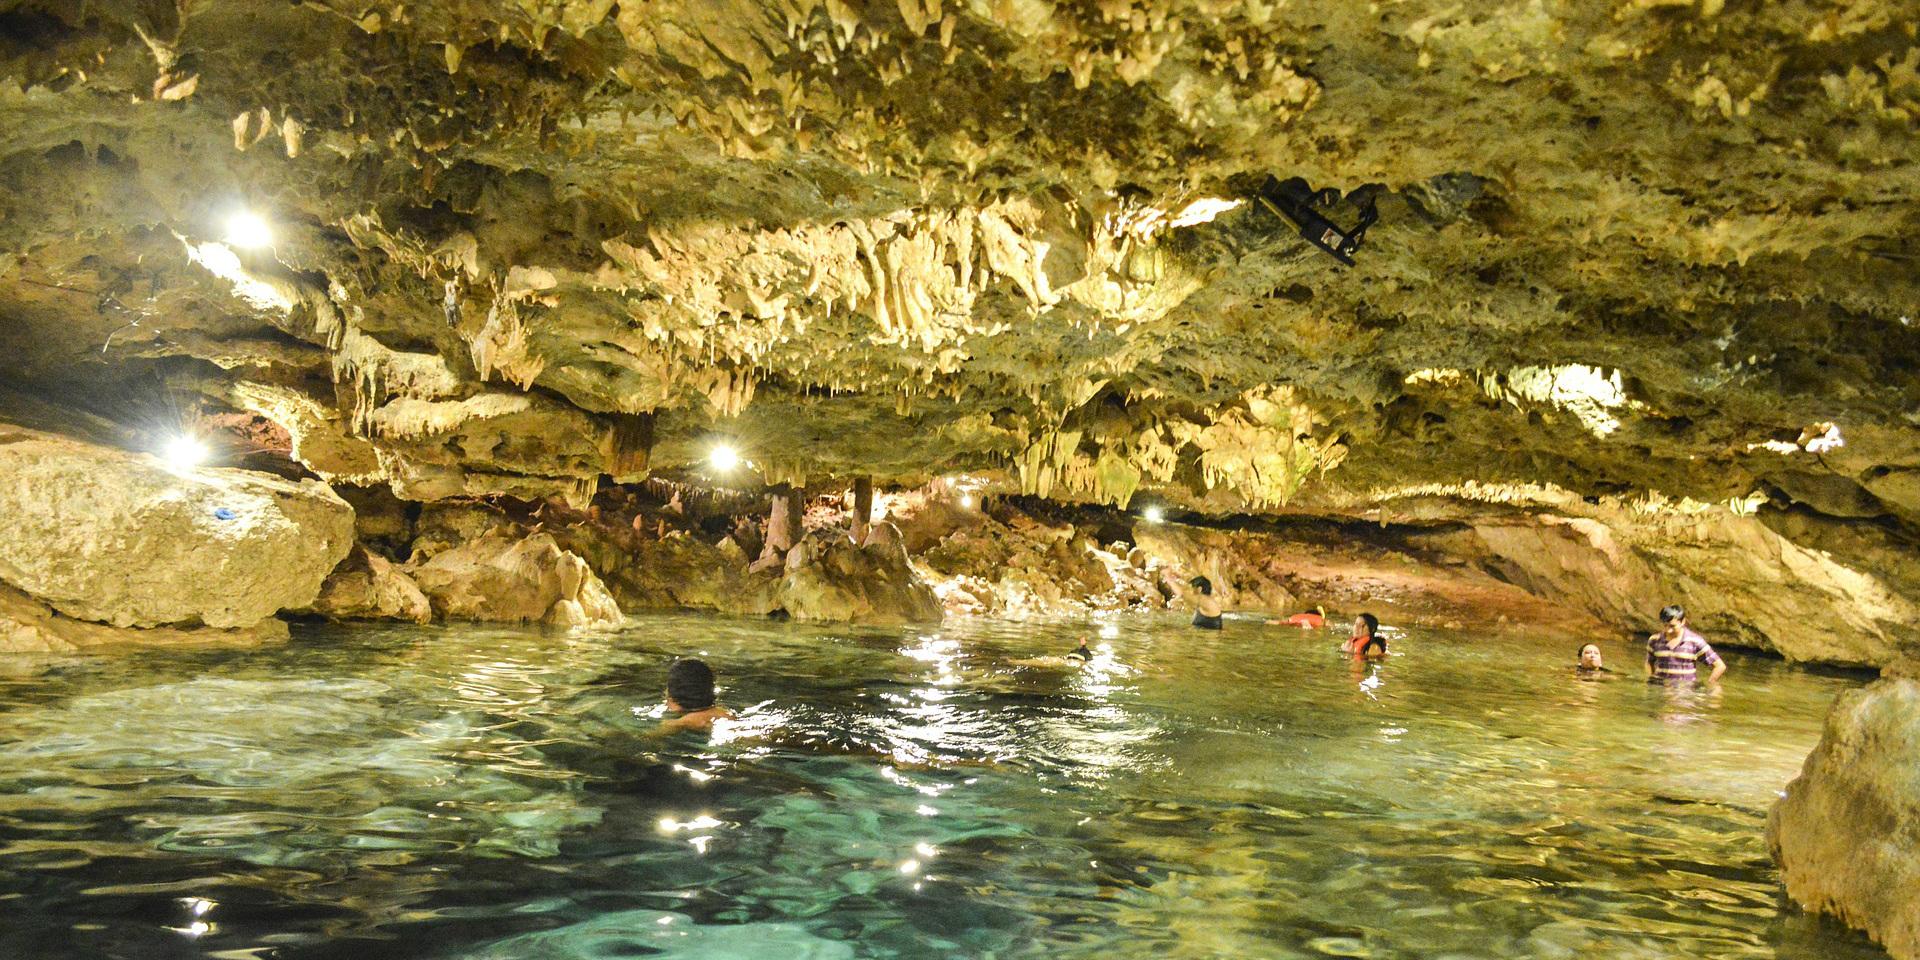 Go swimming in a Ceynote in Puerto Morelos, Mexico